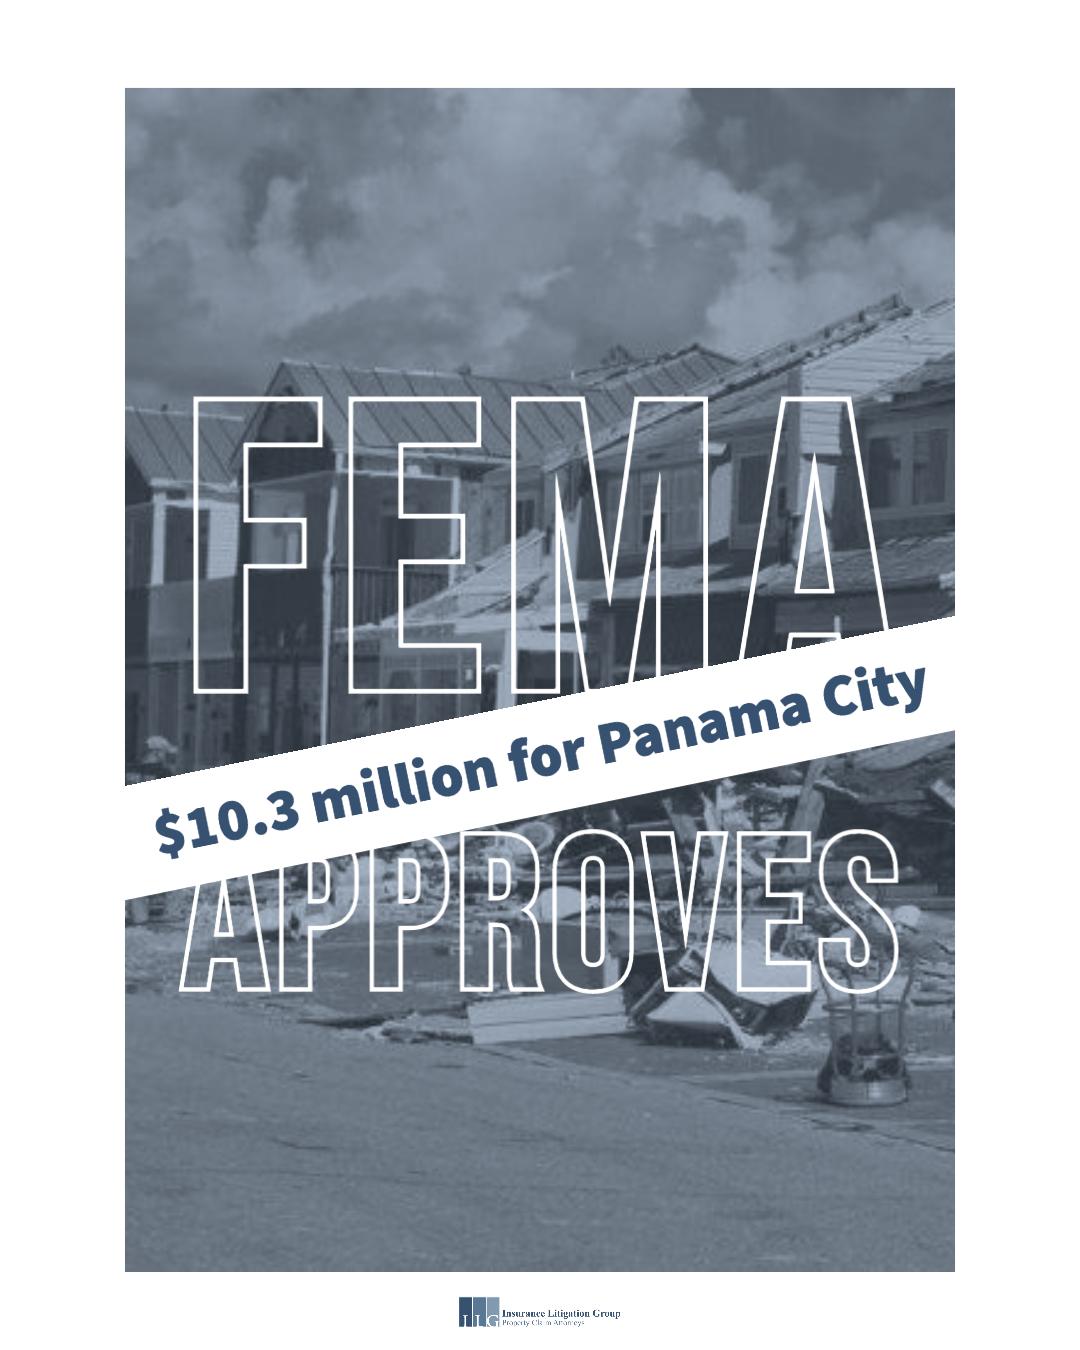 FEMA approves additional $10.3 million for Panama City